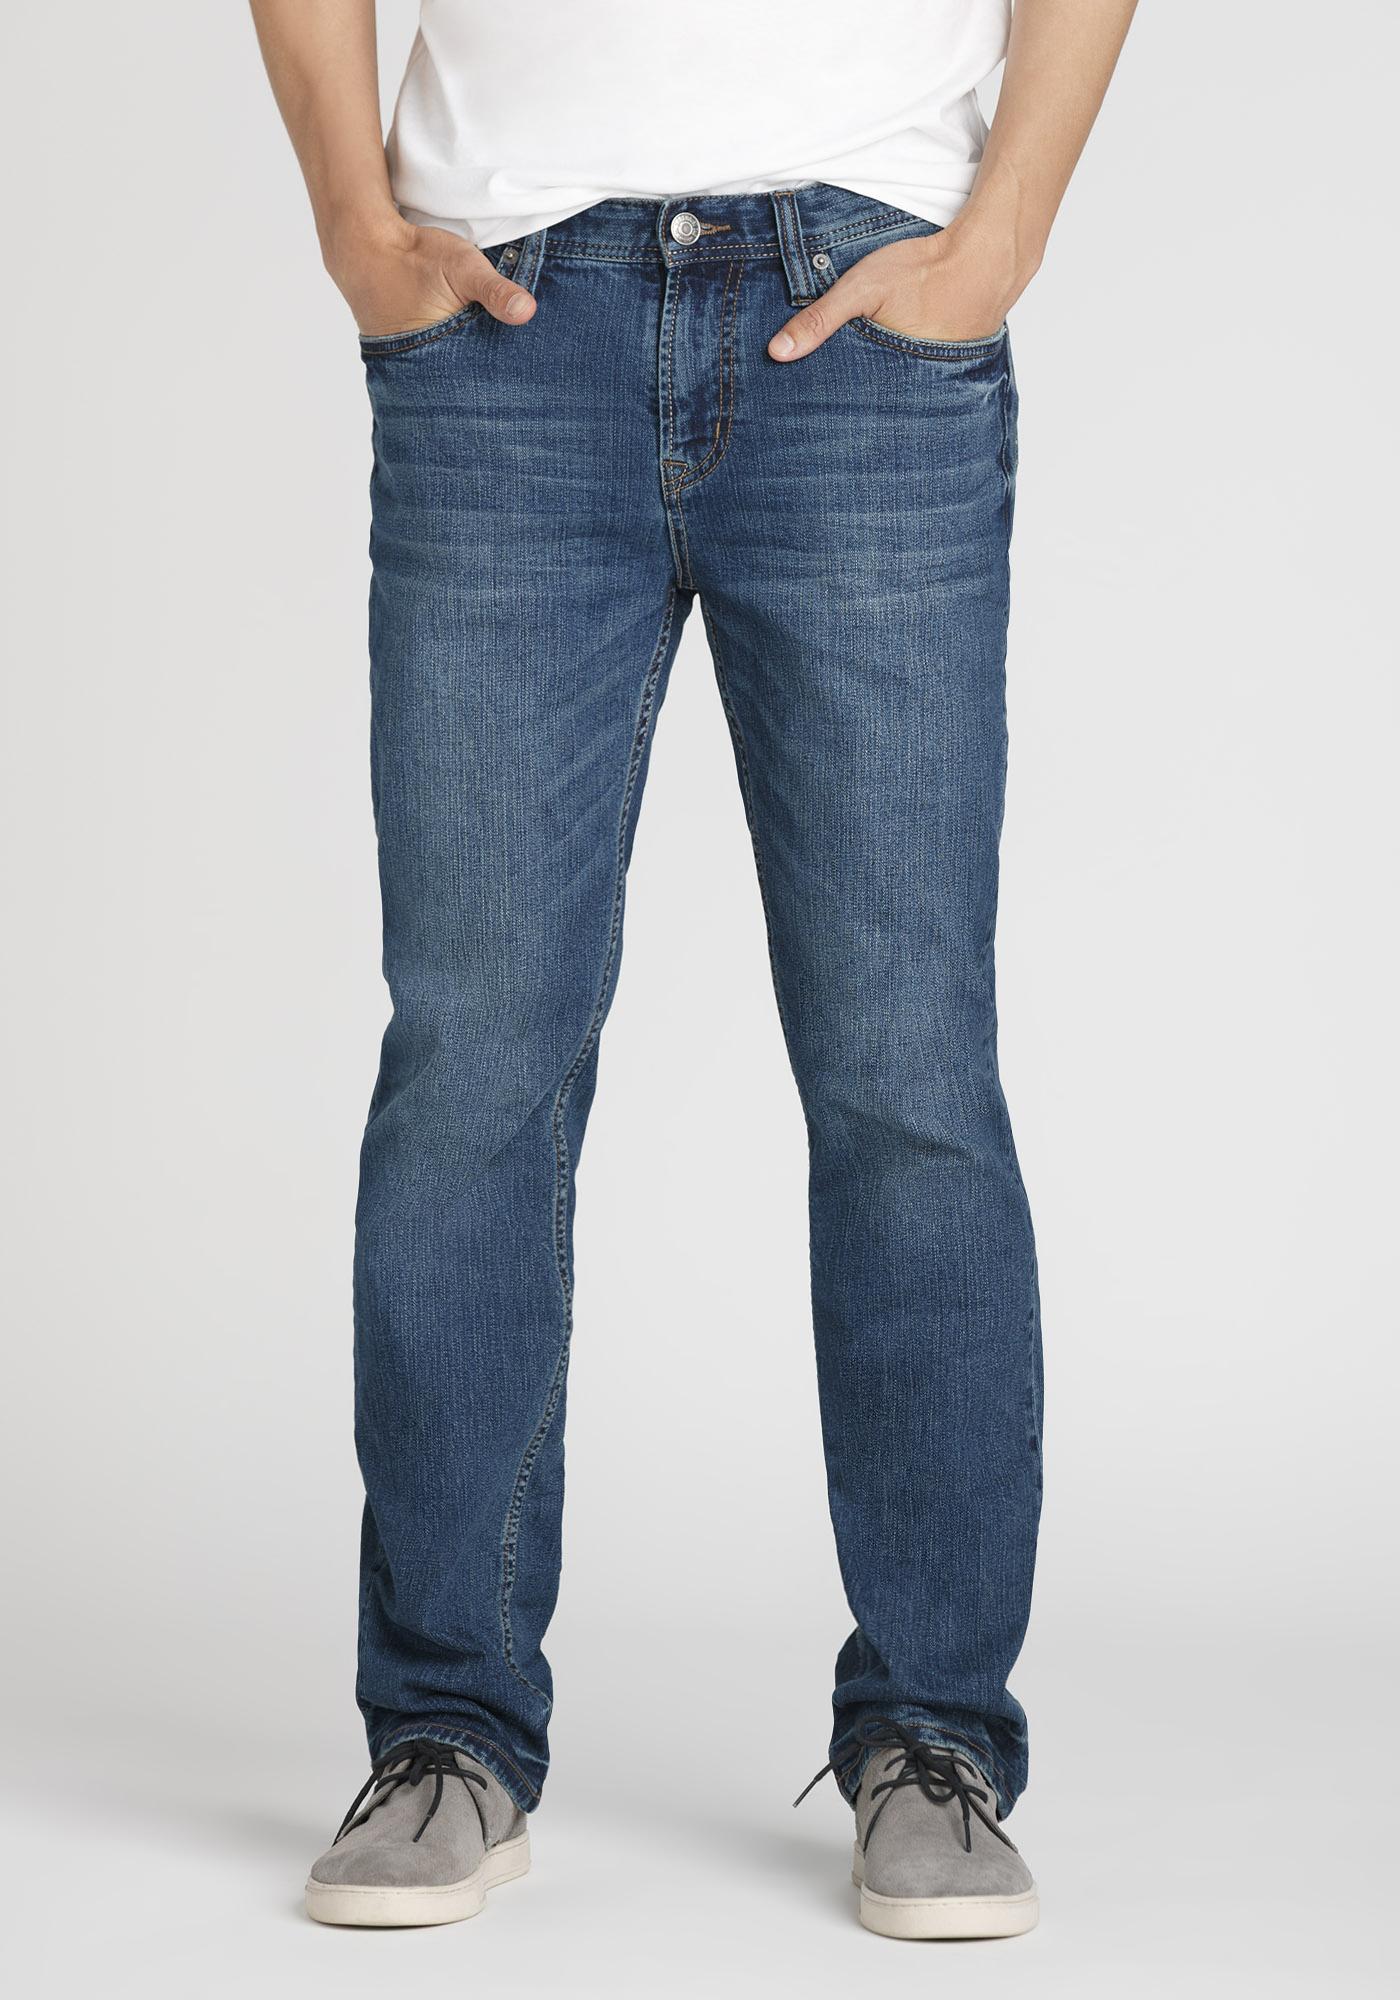 daf4319c Men's Mid Wash Slim Straight Jeans, MEDIUM WASH, hi-res